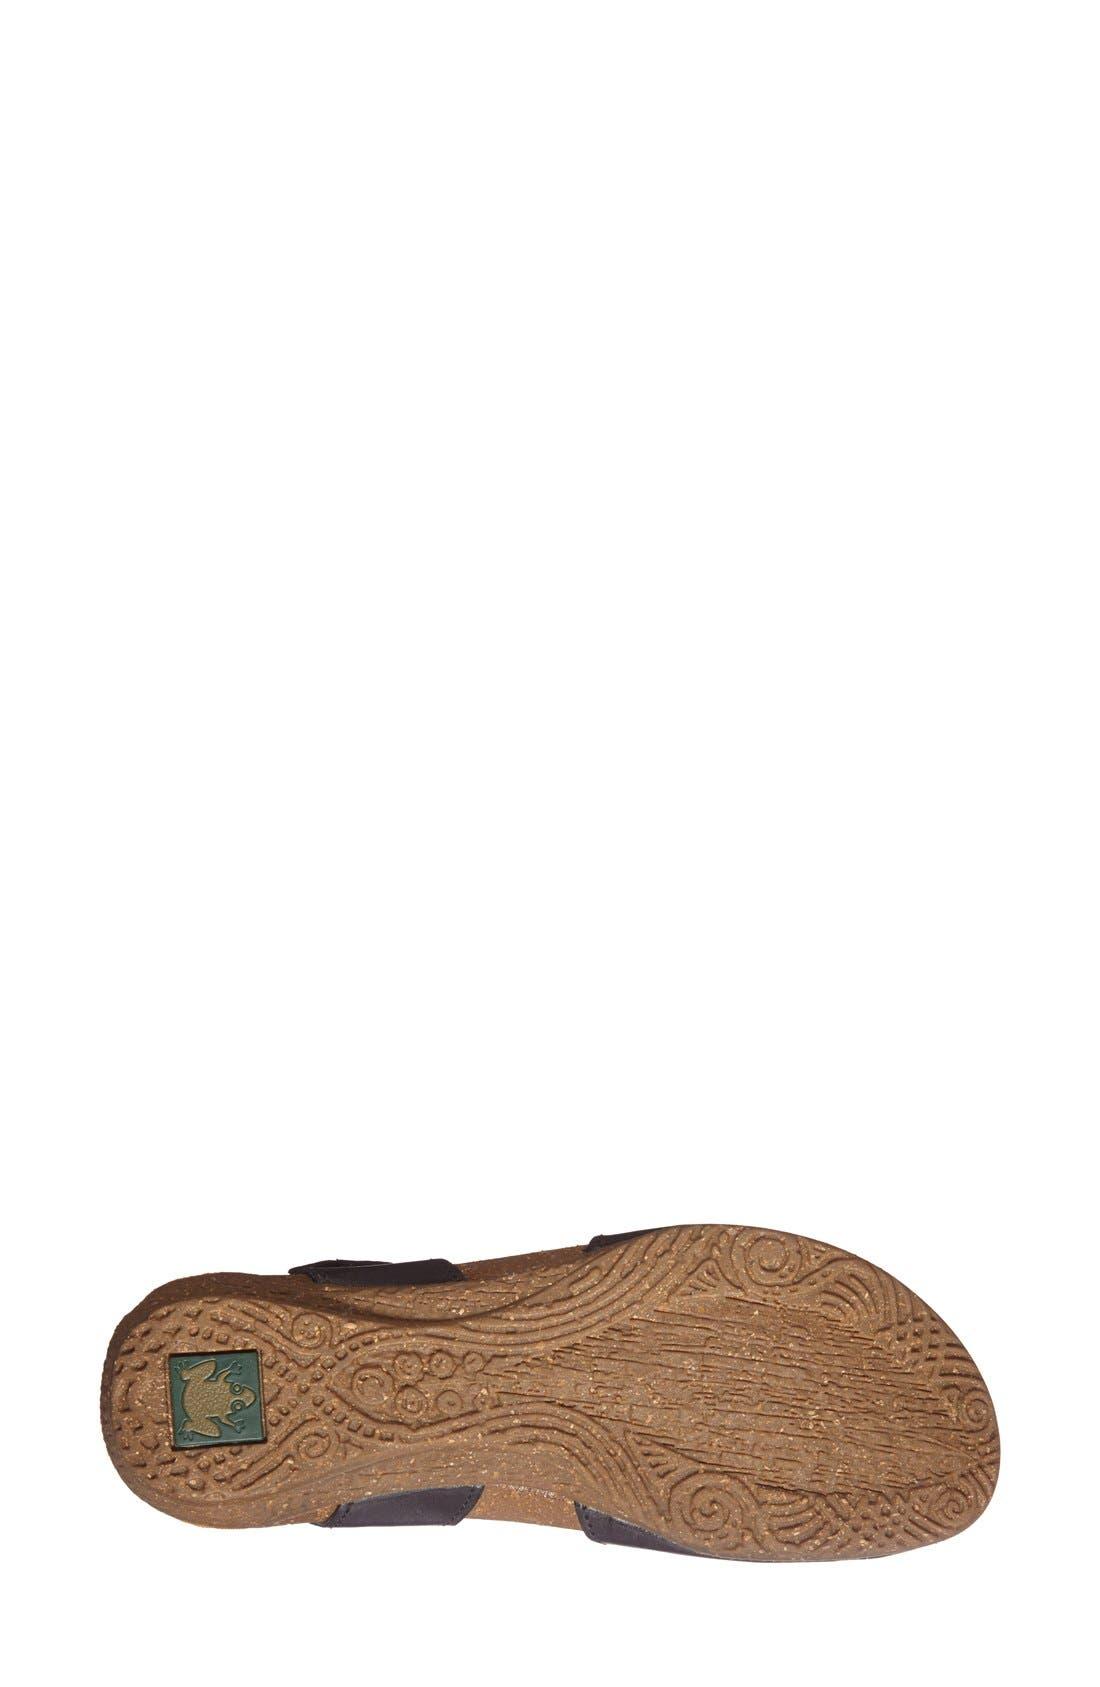 'Wakataua' Leather Flat,                             Alternate thumbnail 3, color,                             001